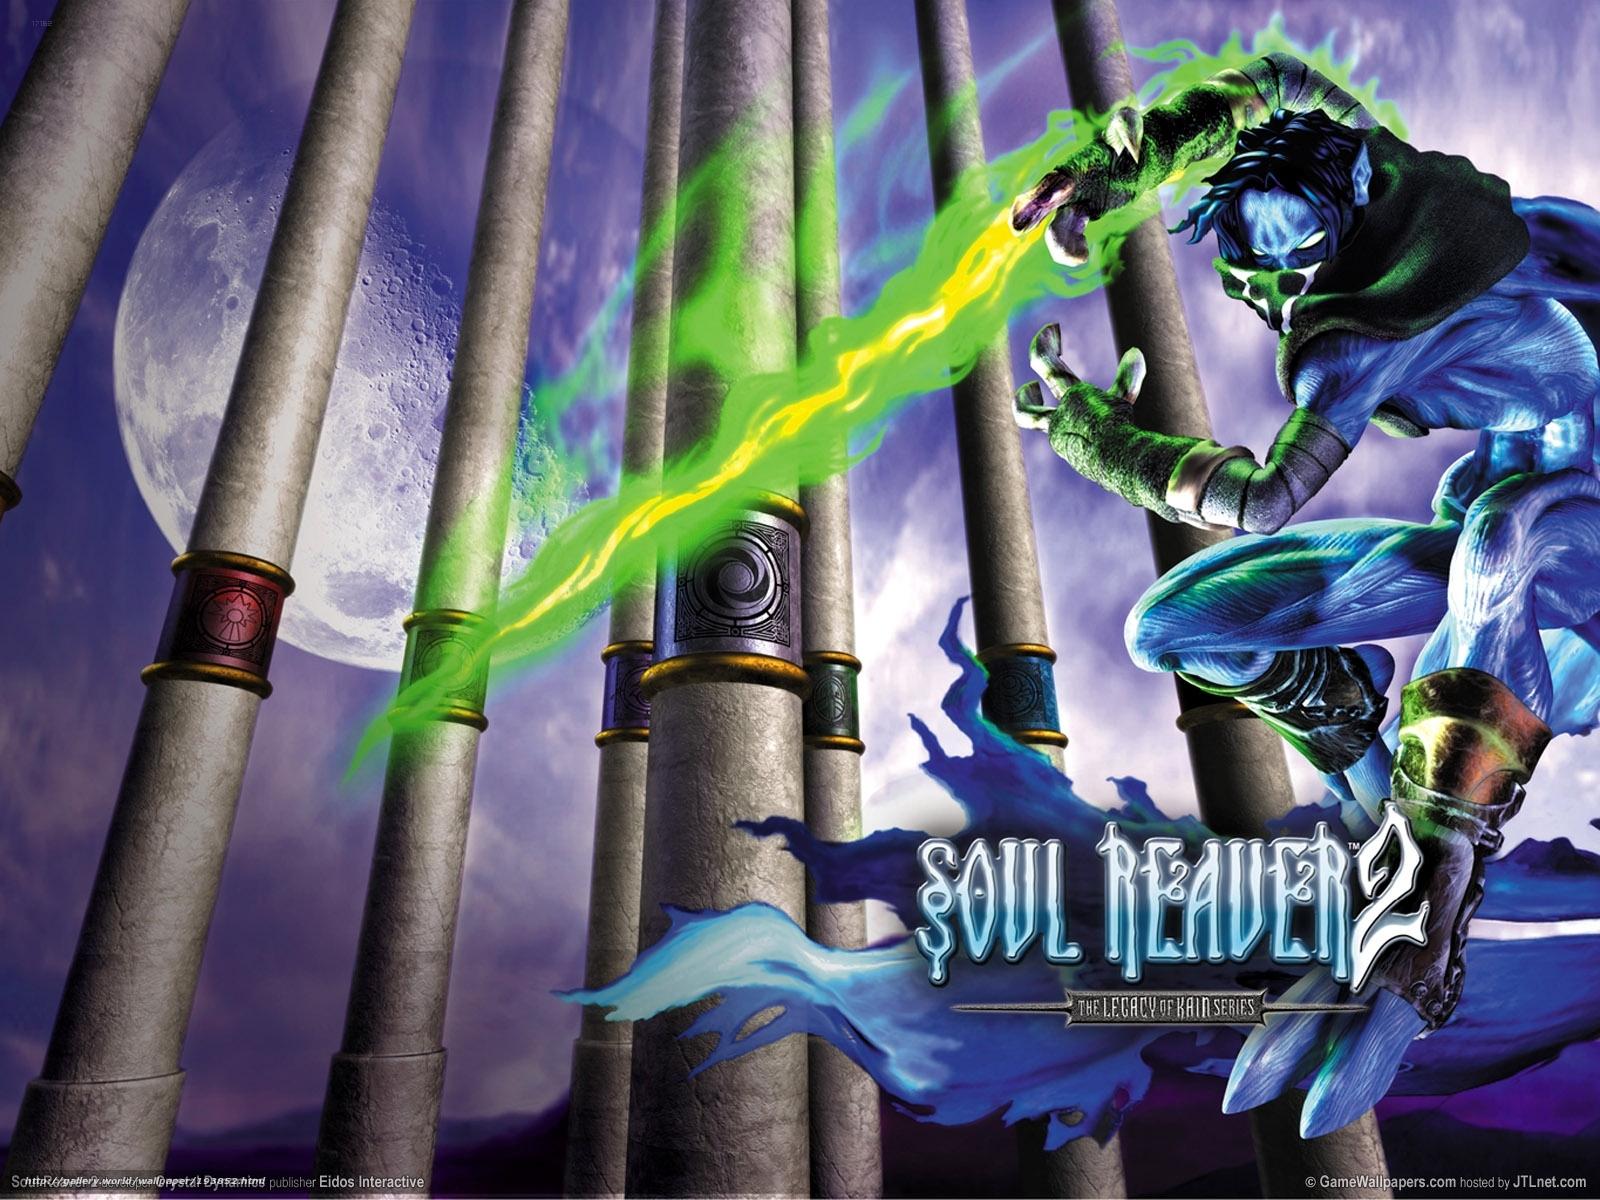 Amazoncom: legacy of kain: soul reaver 2: video games